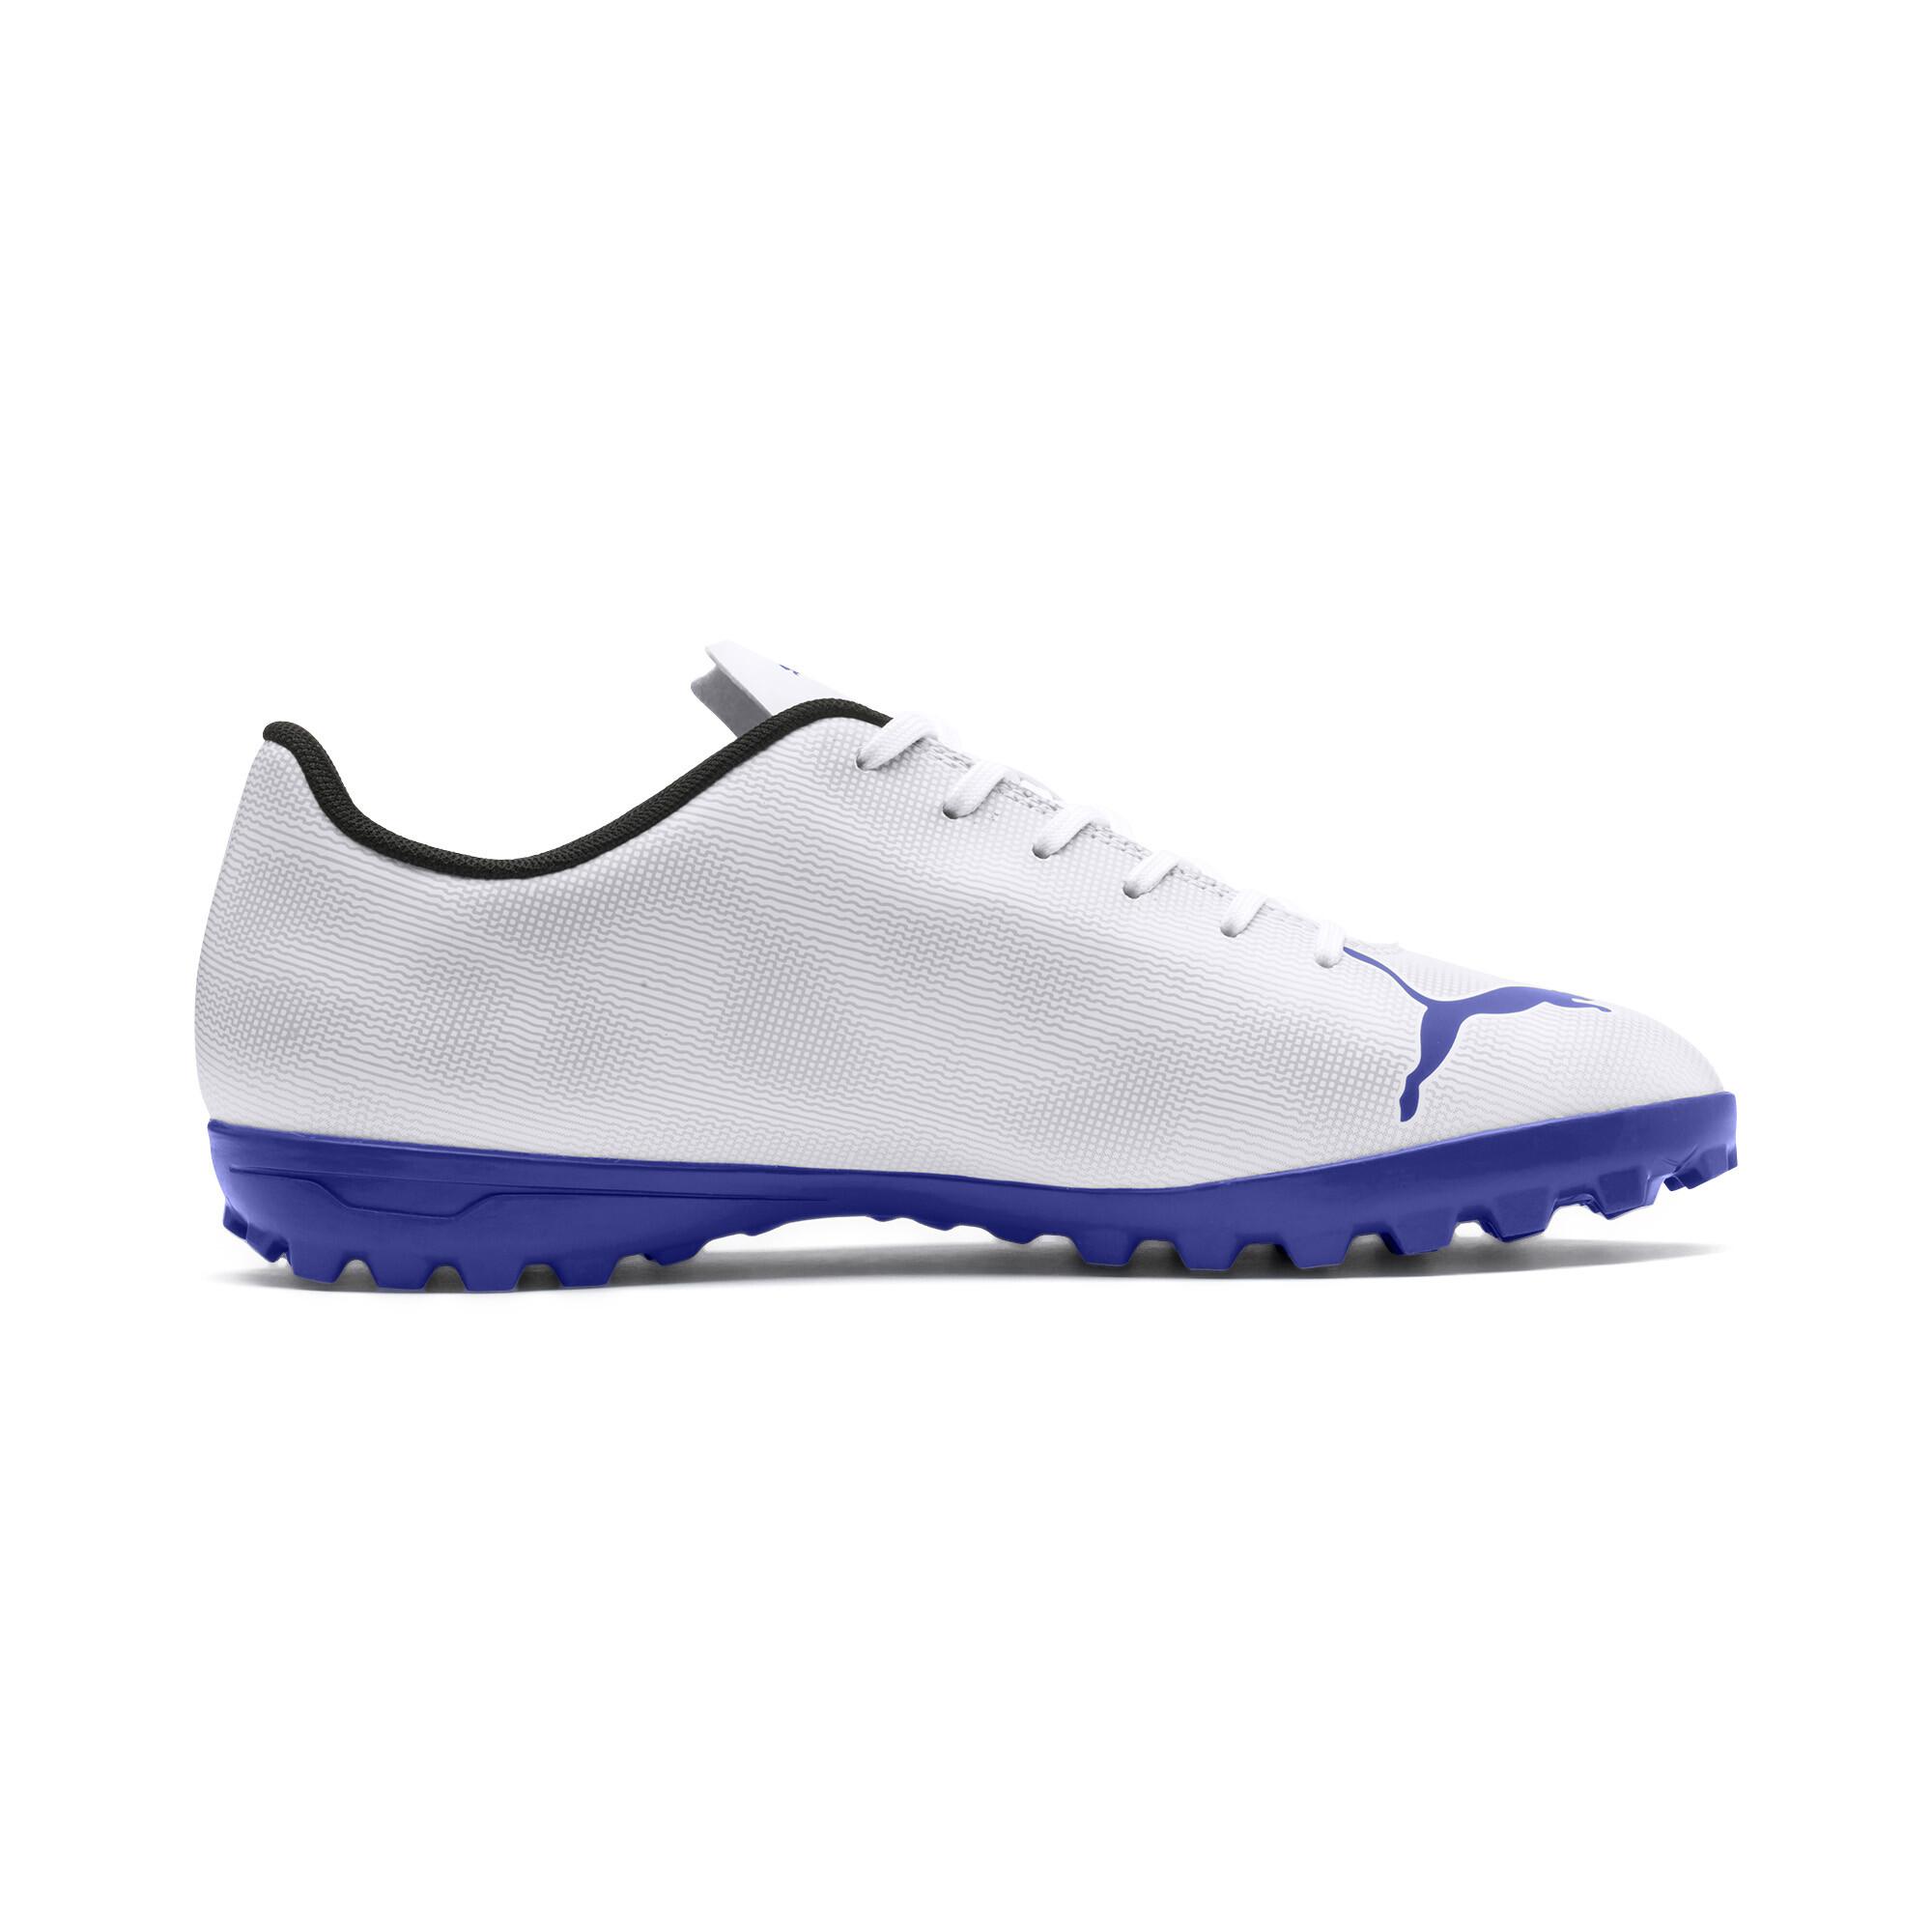 PUMA-Rapido-TT-Men-s-Soccer-Cleats-Men-Shoe-Football thumbnail 14